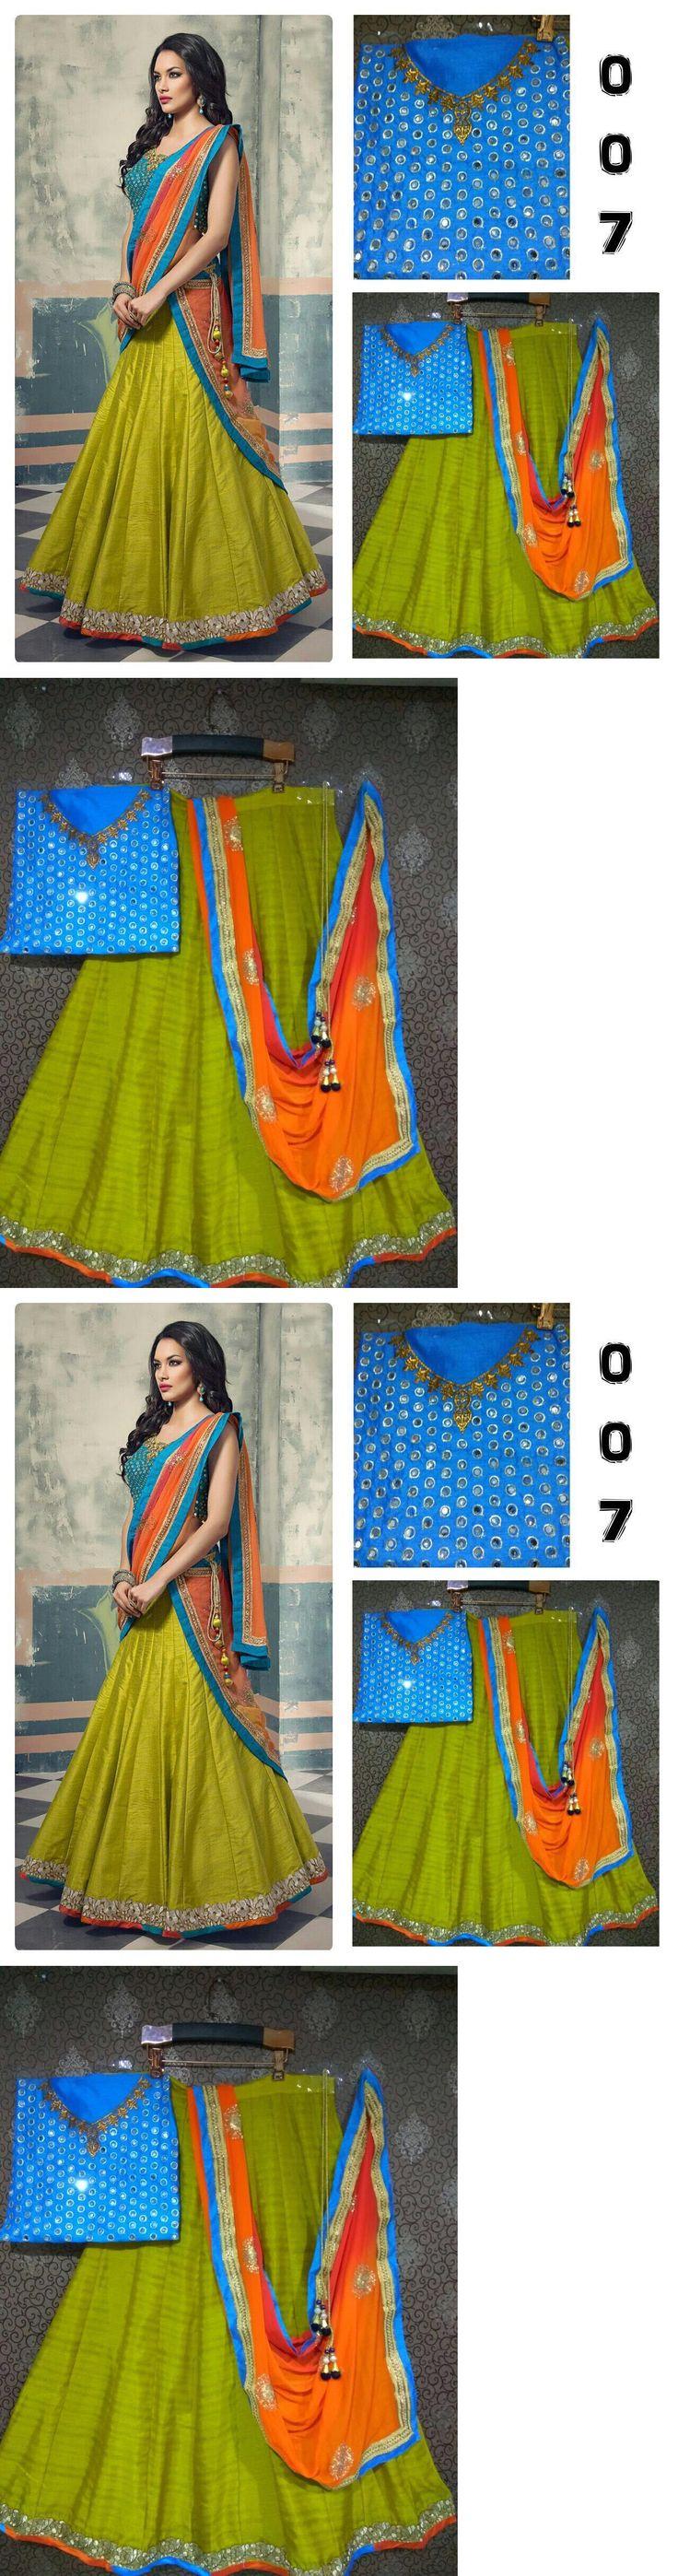 Choli 155247: Bollywood Replica Designer Party Wear Lehenga Choli Wedding Lhenga Sari 0004 -> BUY IT NOW ONLY: $50 on eBay!